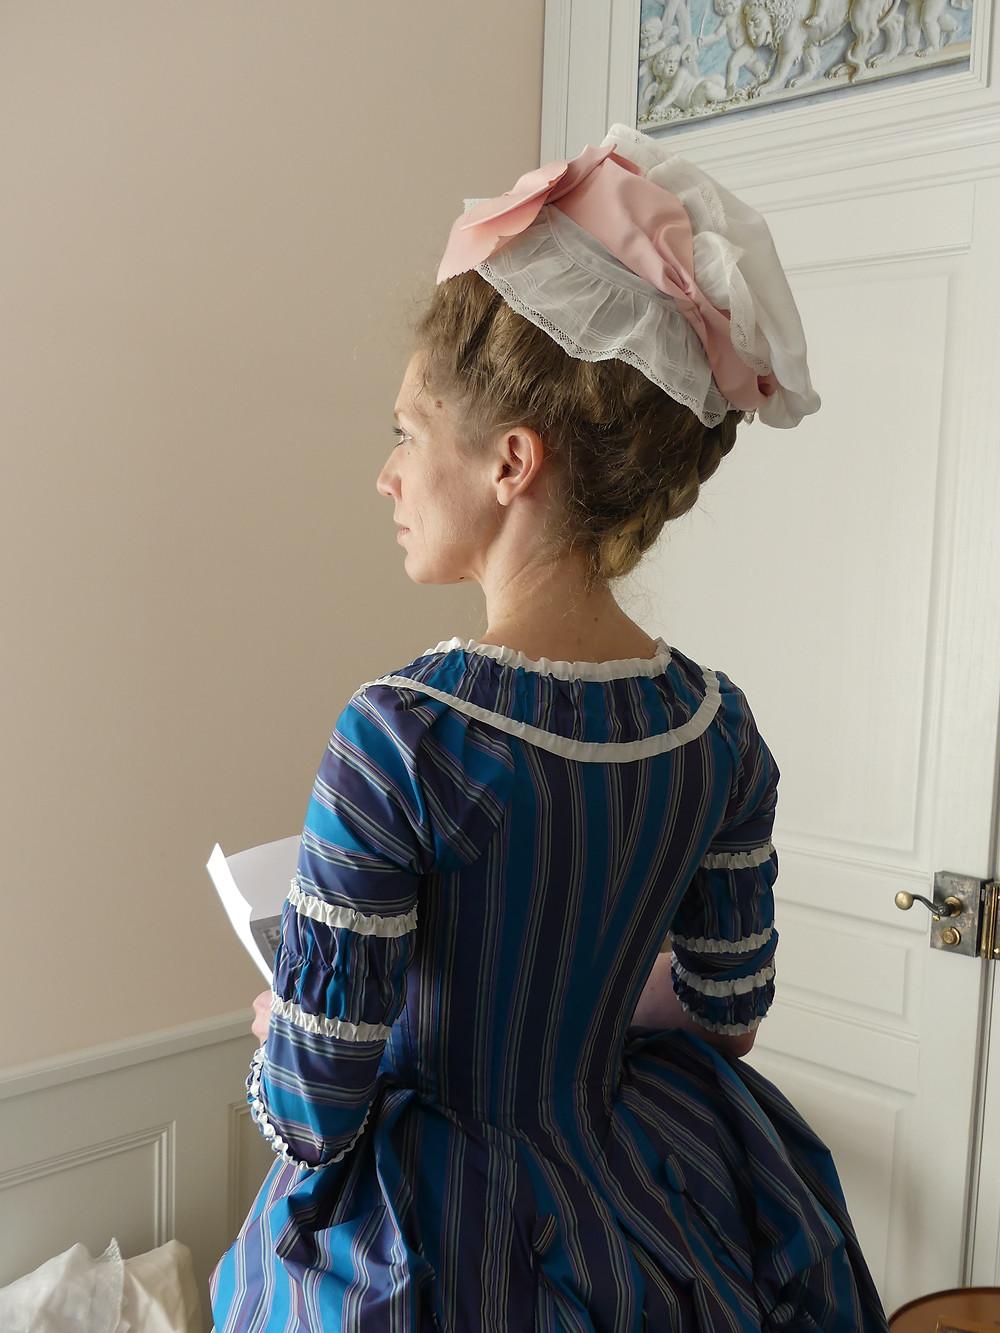 Die Rückenansicht der Polonaise aus dem Musée d'Art et d'Histoire in Fribourg. Foto: Fabrice Robardey